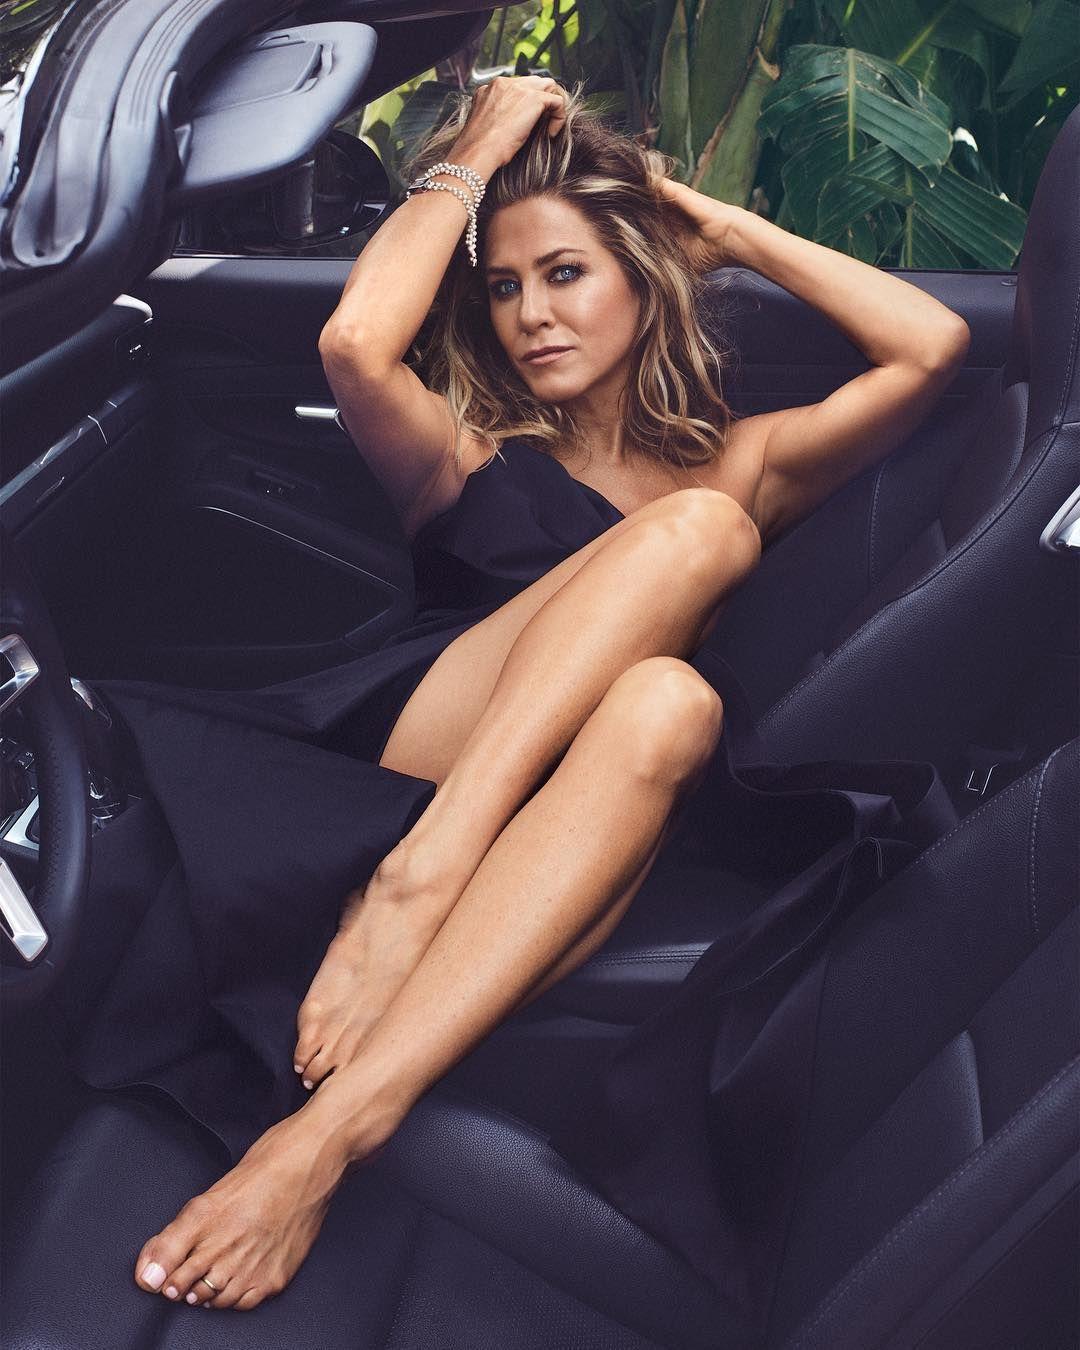 Actrices Porno Feet Top jenniferaniston #toes #barefeet #barefoot #foot #feet #celeb